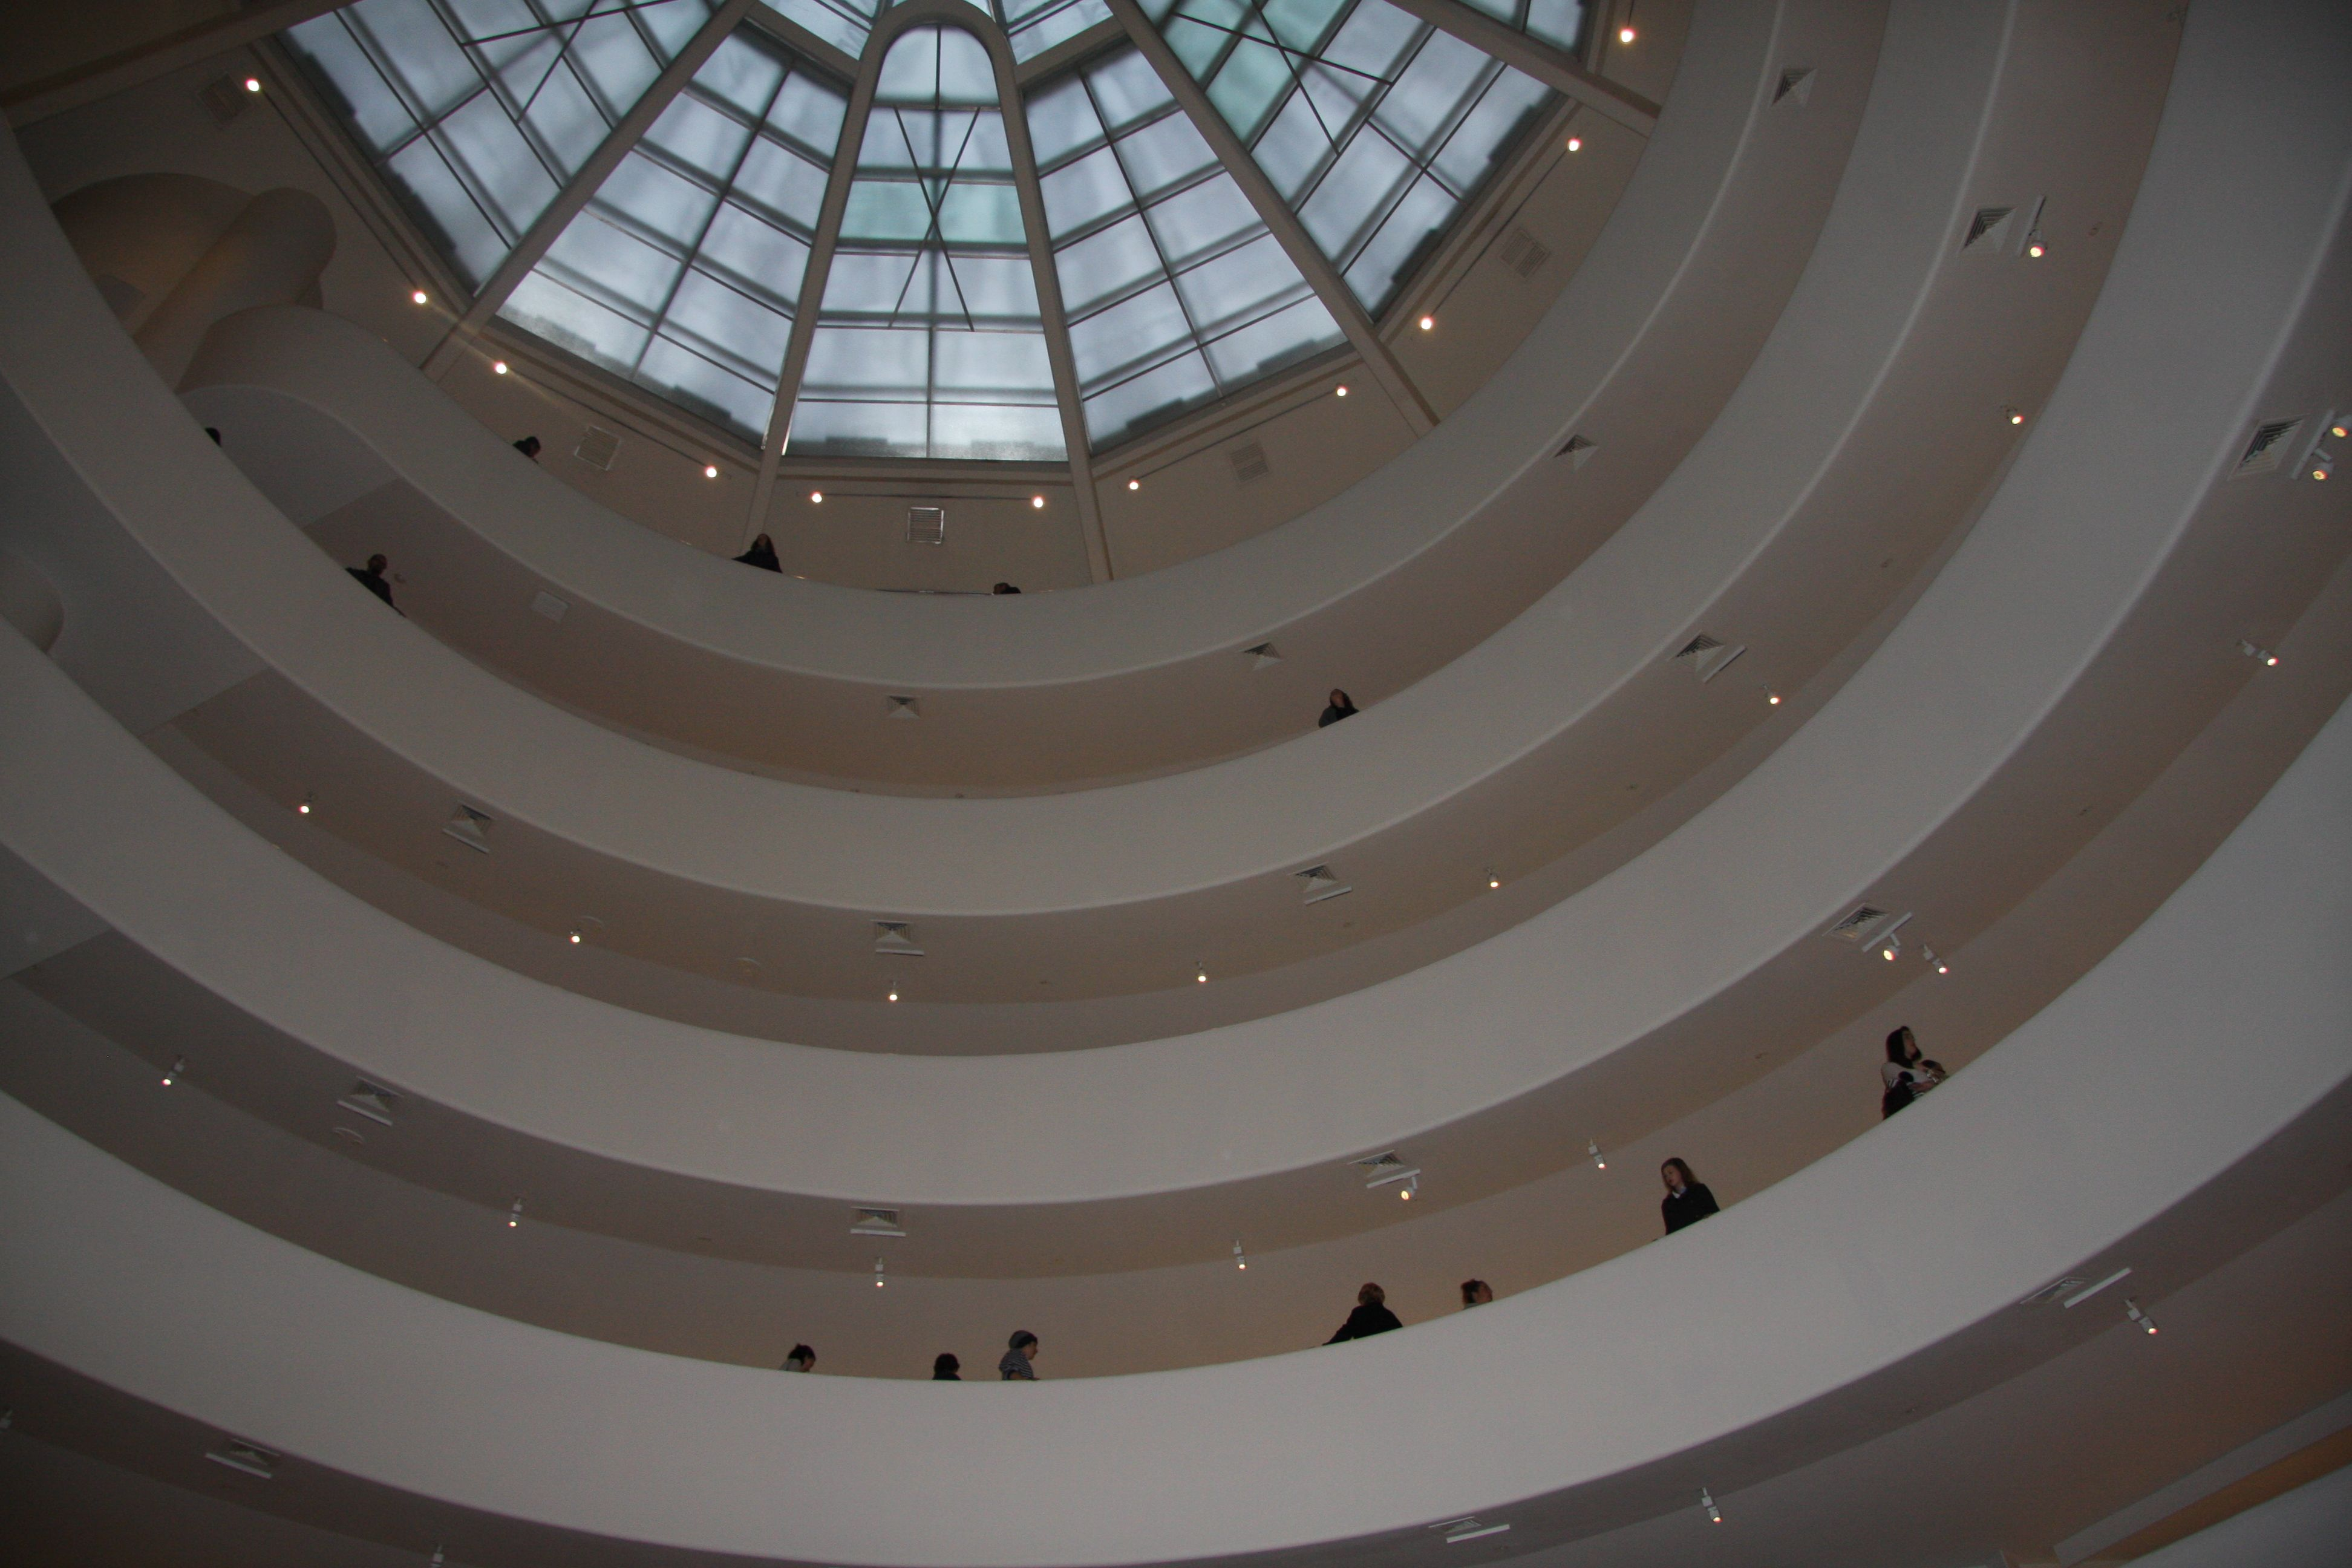 Inside the Guggenheim | Guggenheim, Museum  Guggenheim Inside